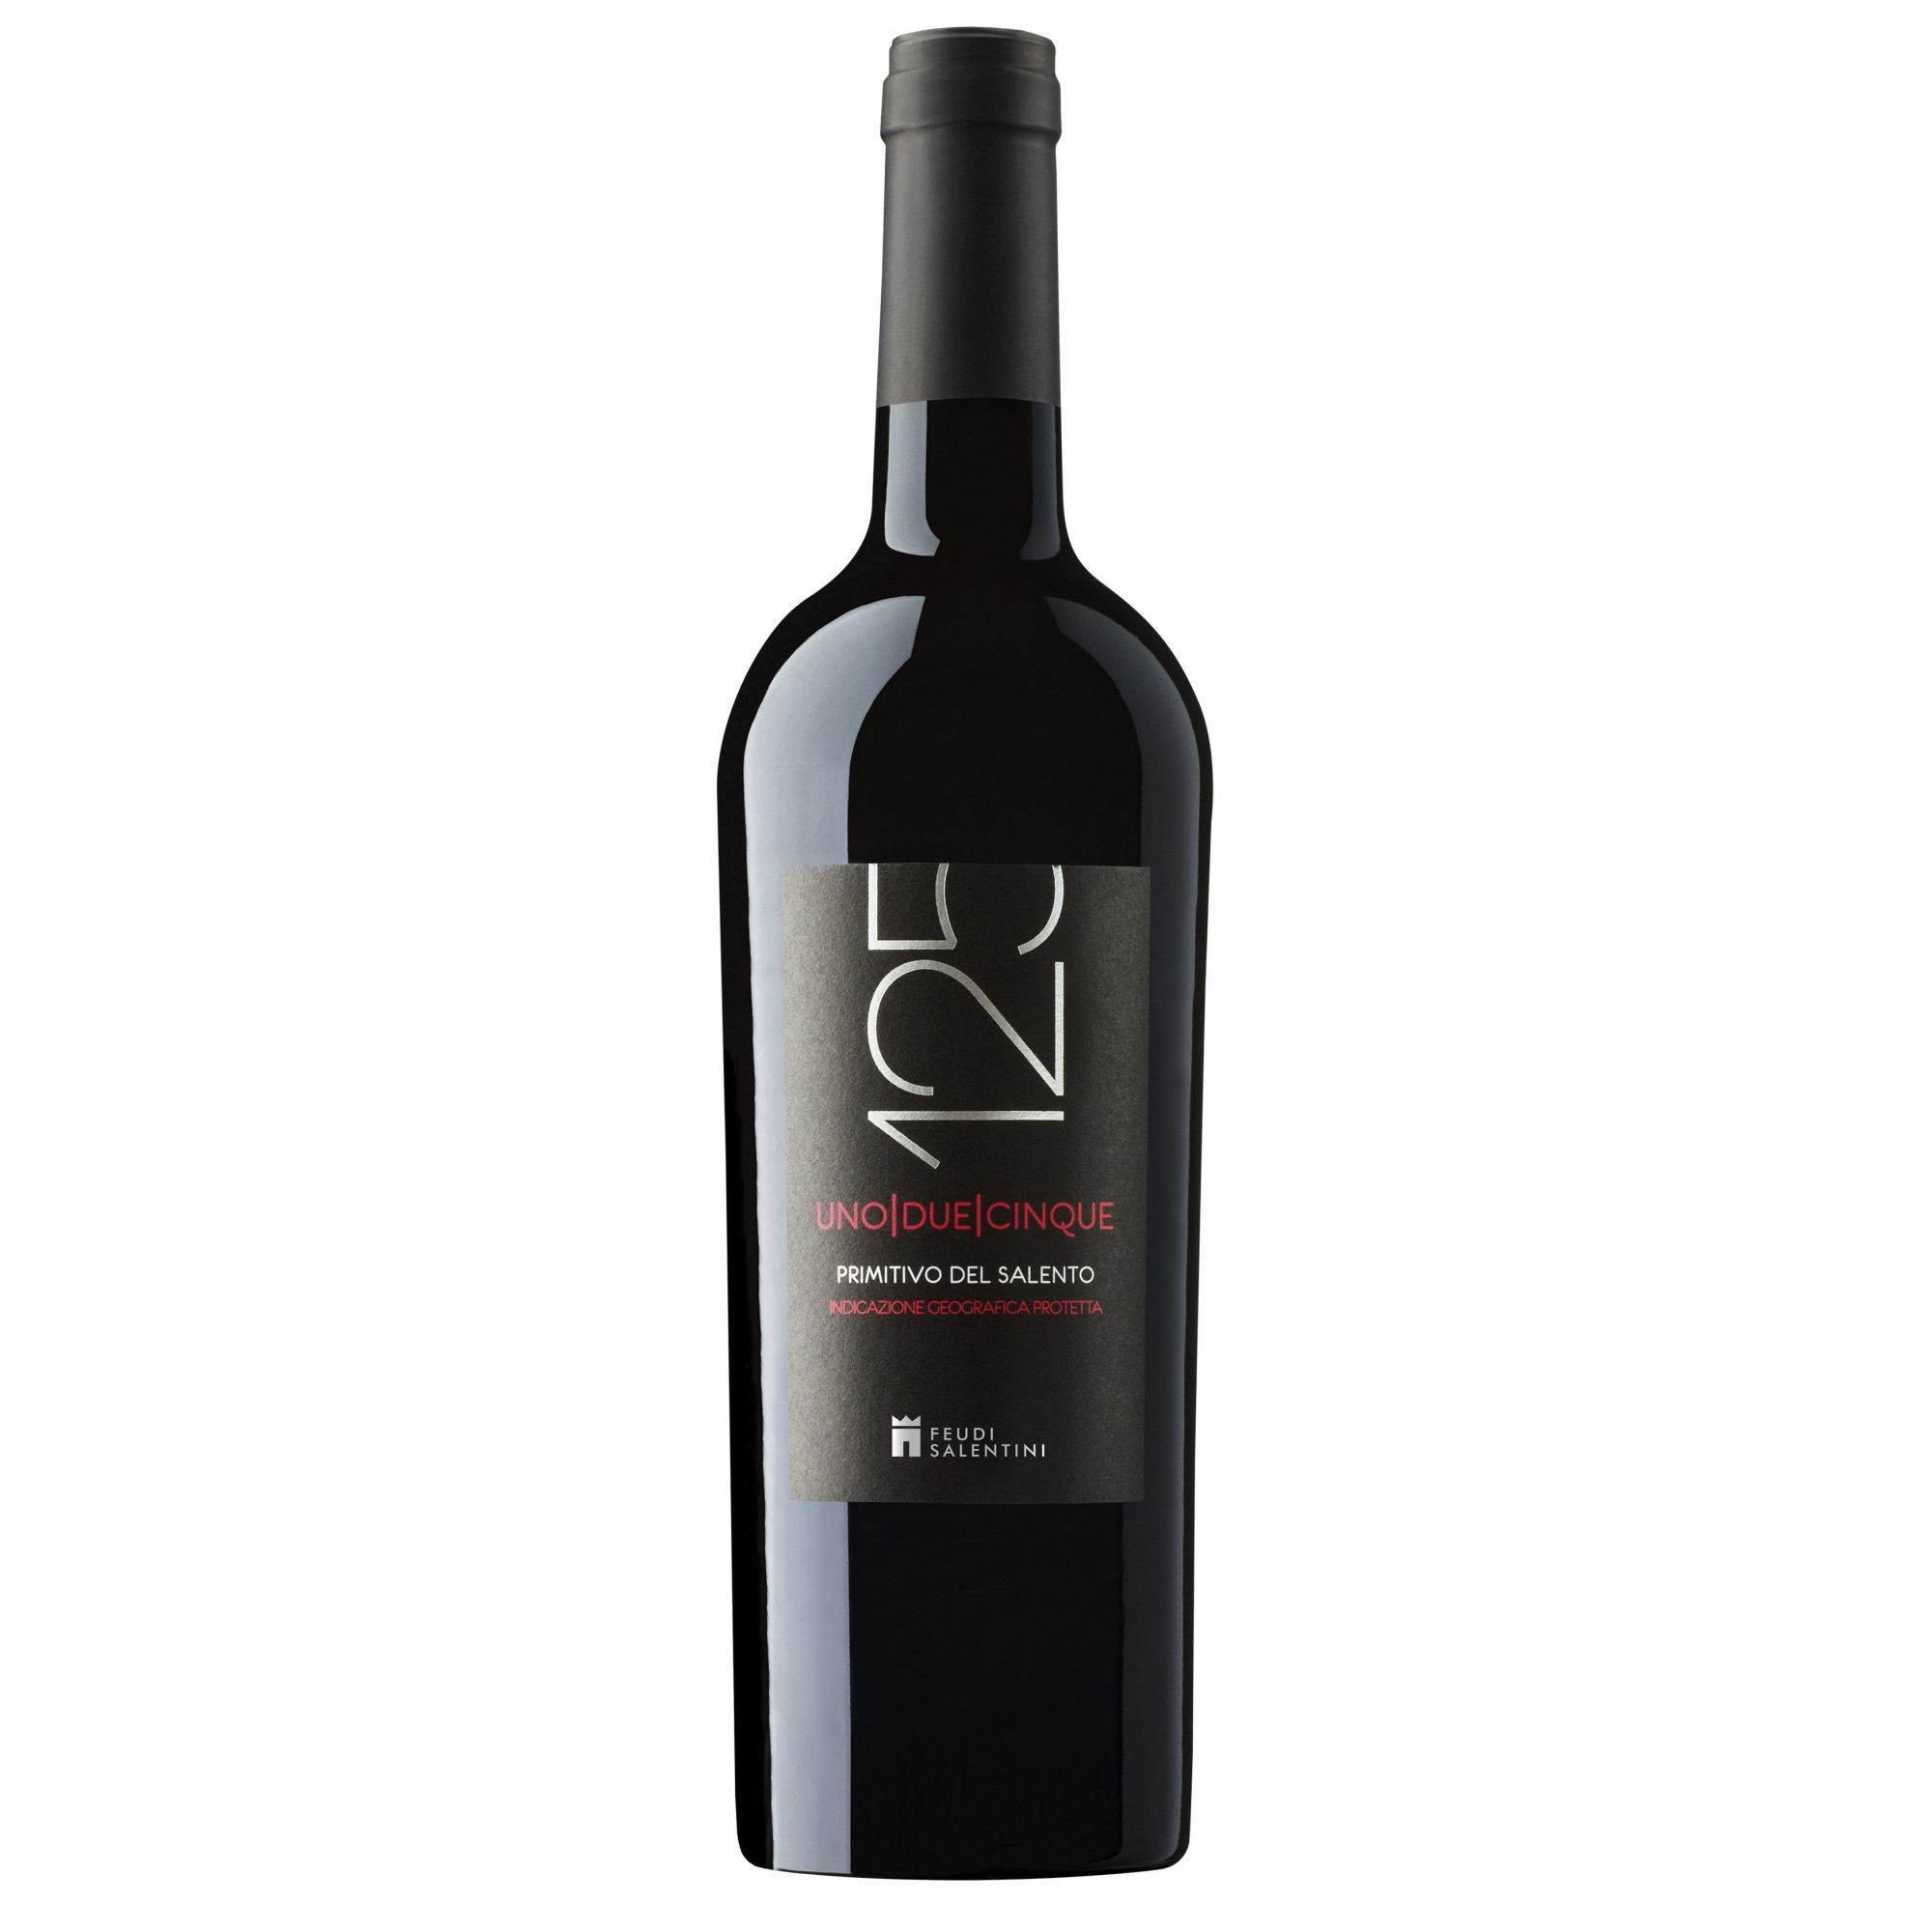 Vinho 125 Primitivo del Salento